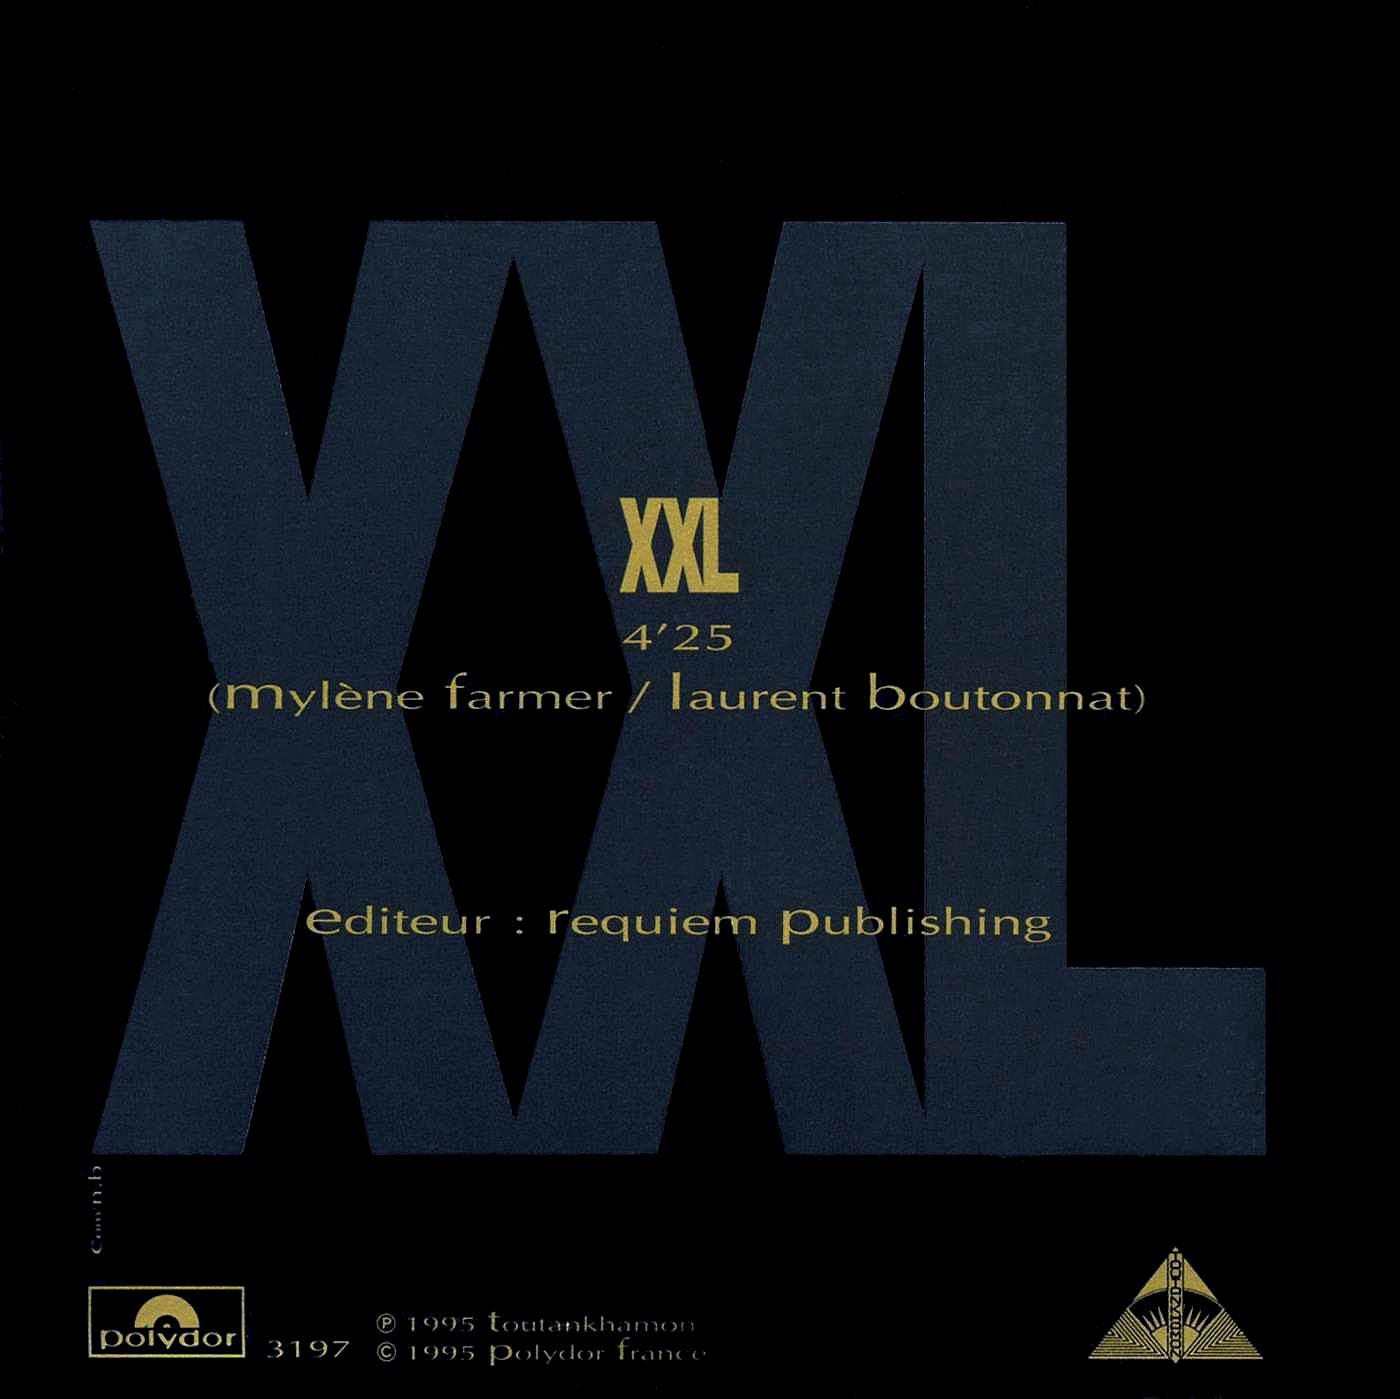 xxl promo referentiel mylene farmer